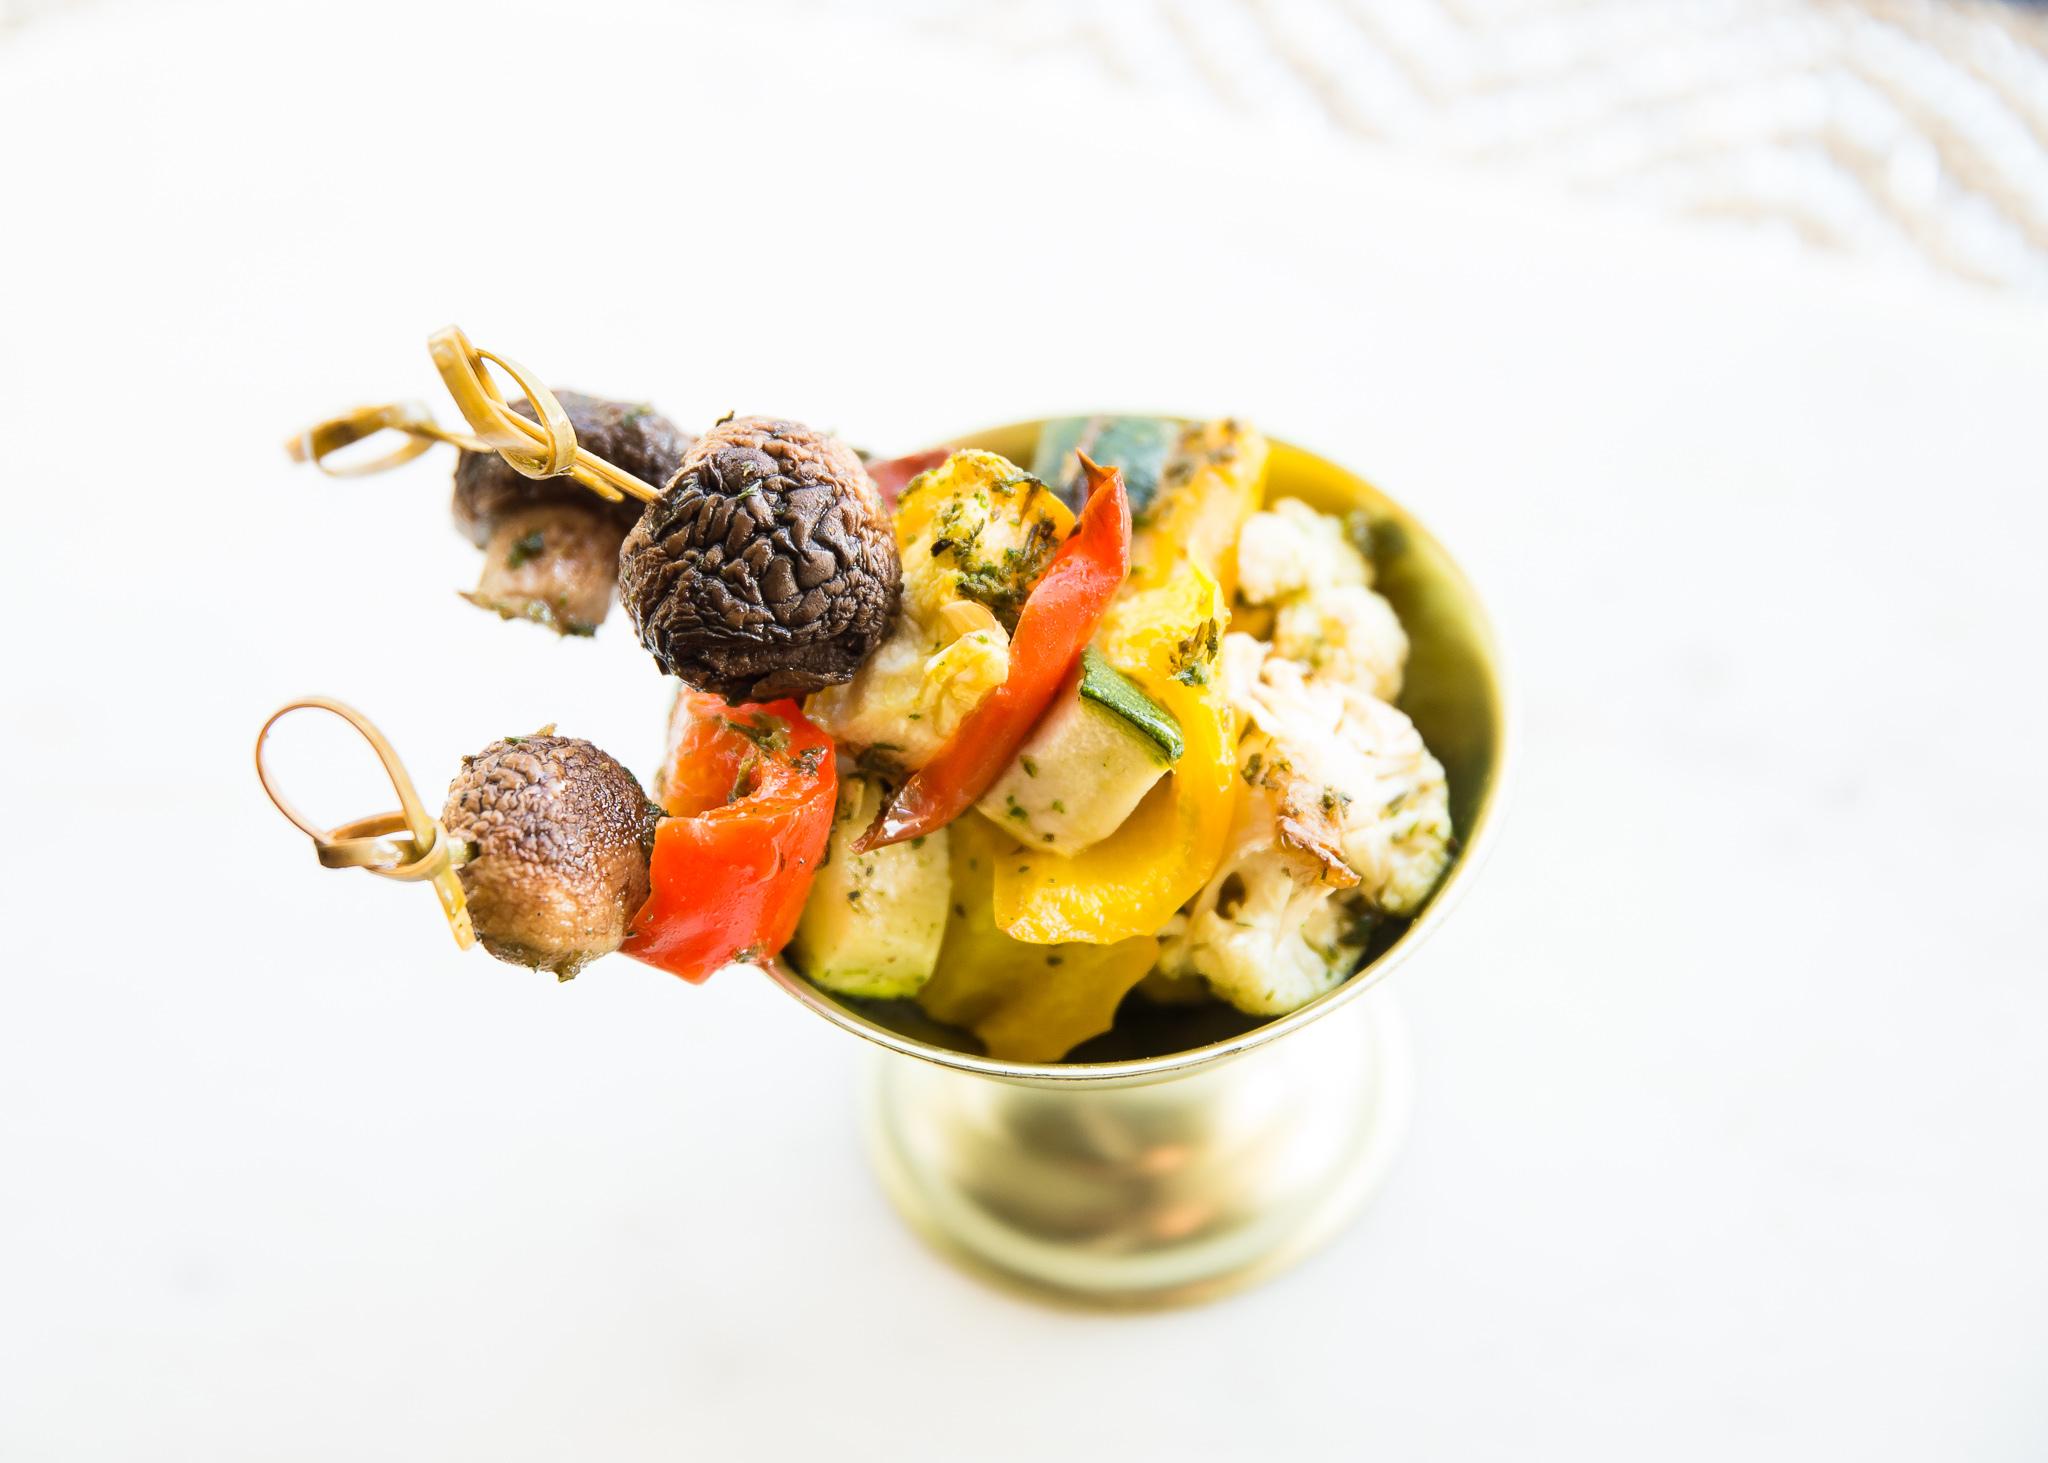 Honest Plate vegetable kabobs.